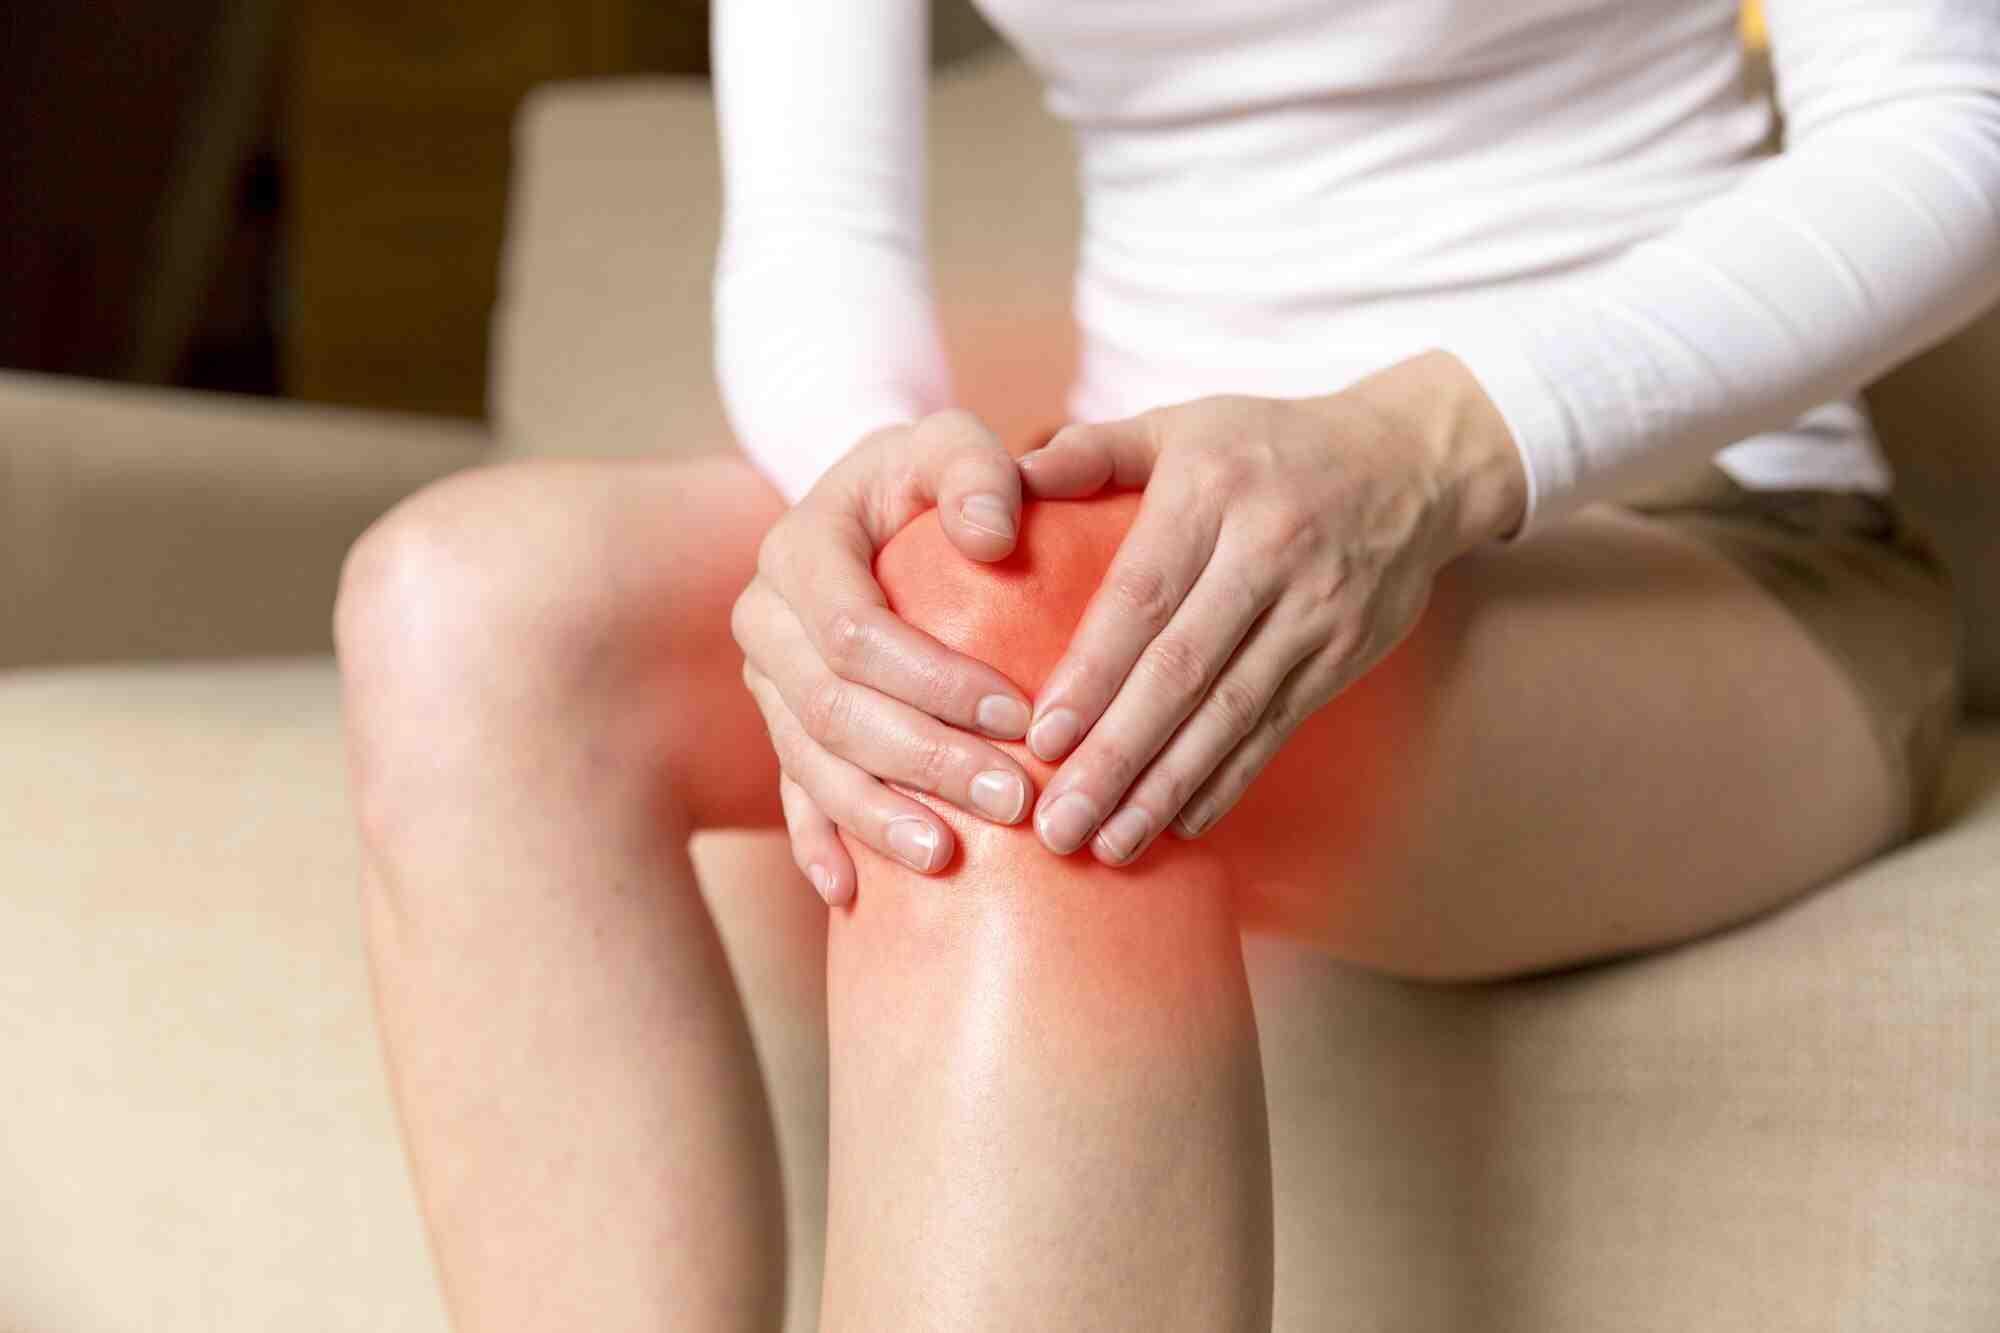 Comment soigner une inflammation sans Anti-inflammatoire ?